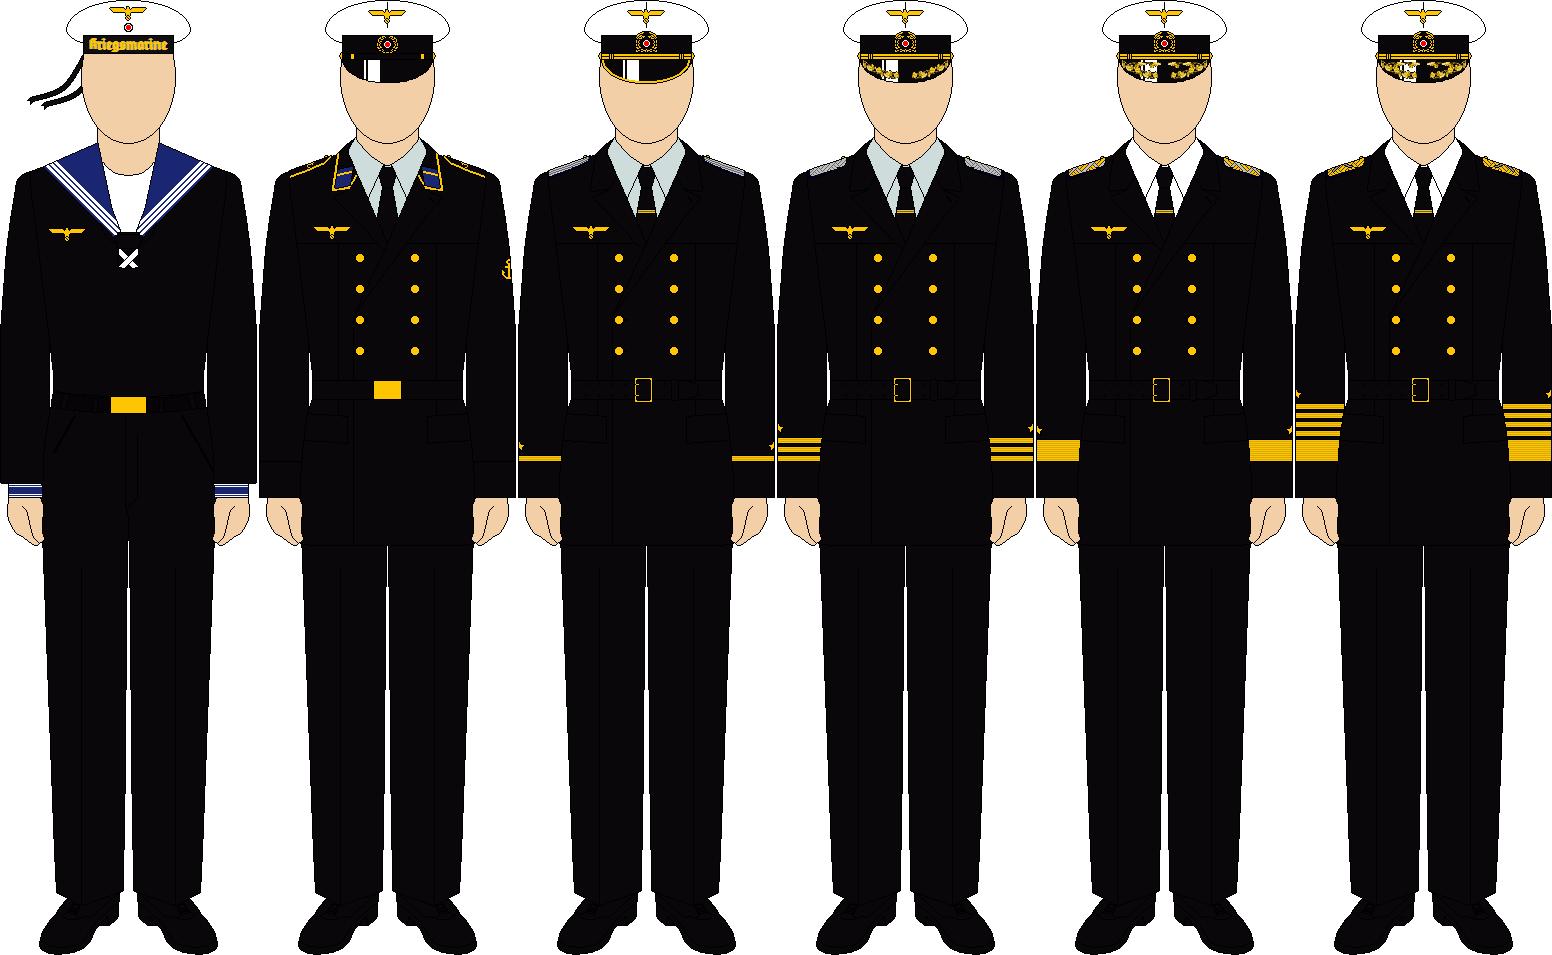 Kriegsmarine winter service uniforms by thefalconette-d52poqu